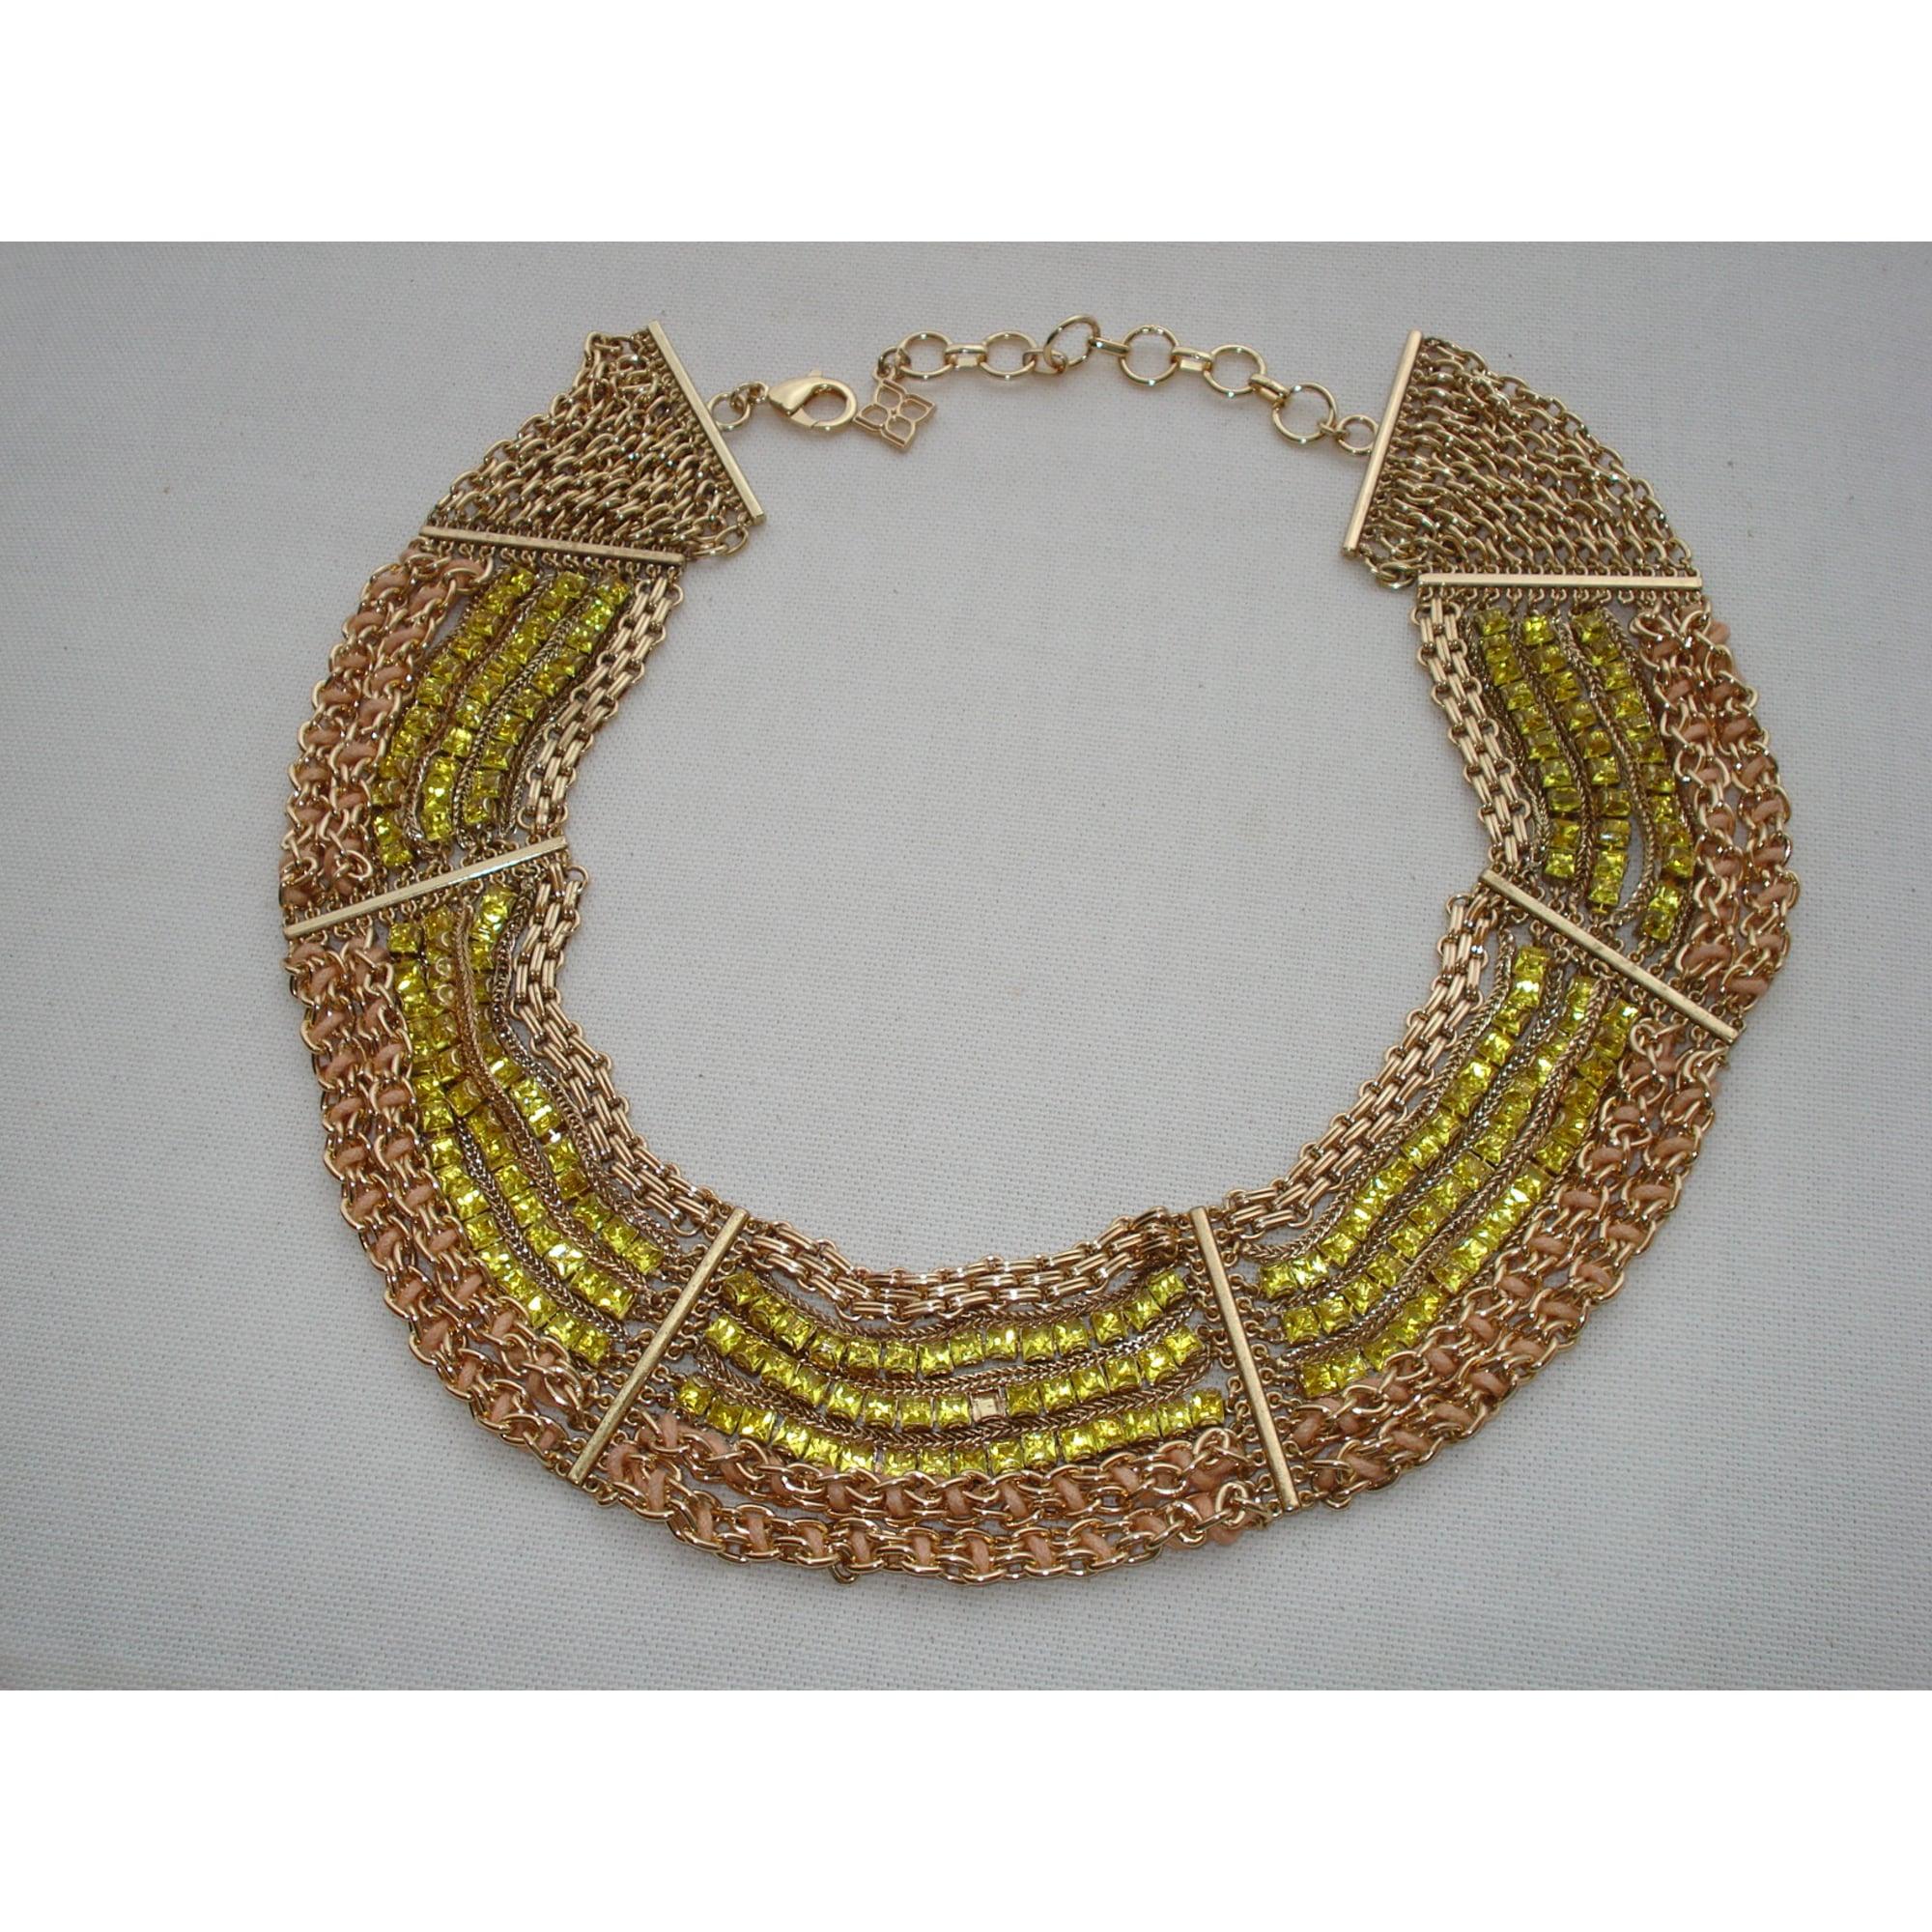 Collier BCBG MAX AZRIA métal doré